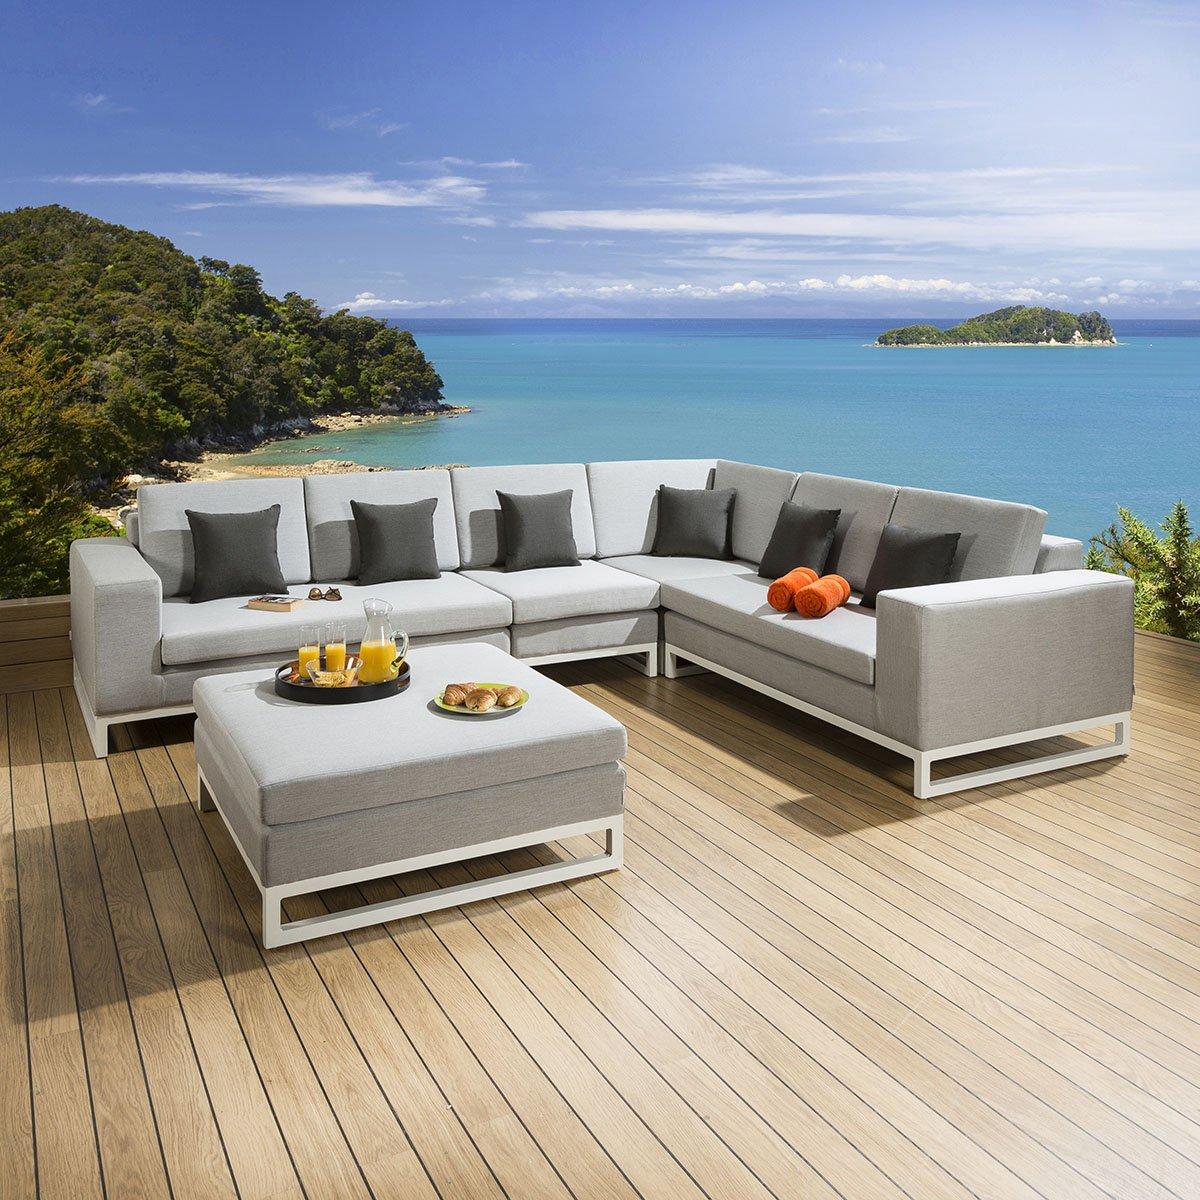 7b205bd5c9b9 #garden #spring #summer #outdoors #sun #sunshine #family #furniture #patio  #decking #bbq #quatropi pic.twitter.com/whQap8tcDT